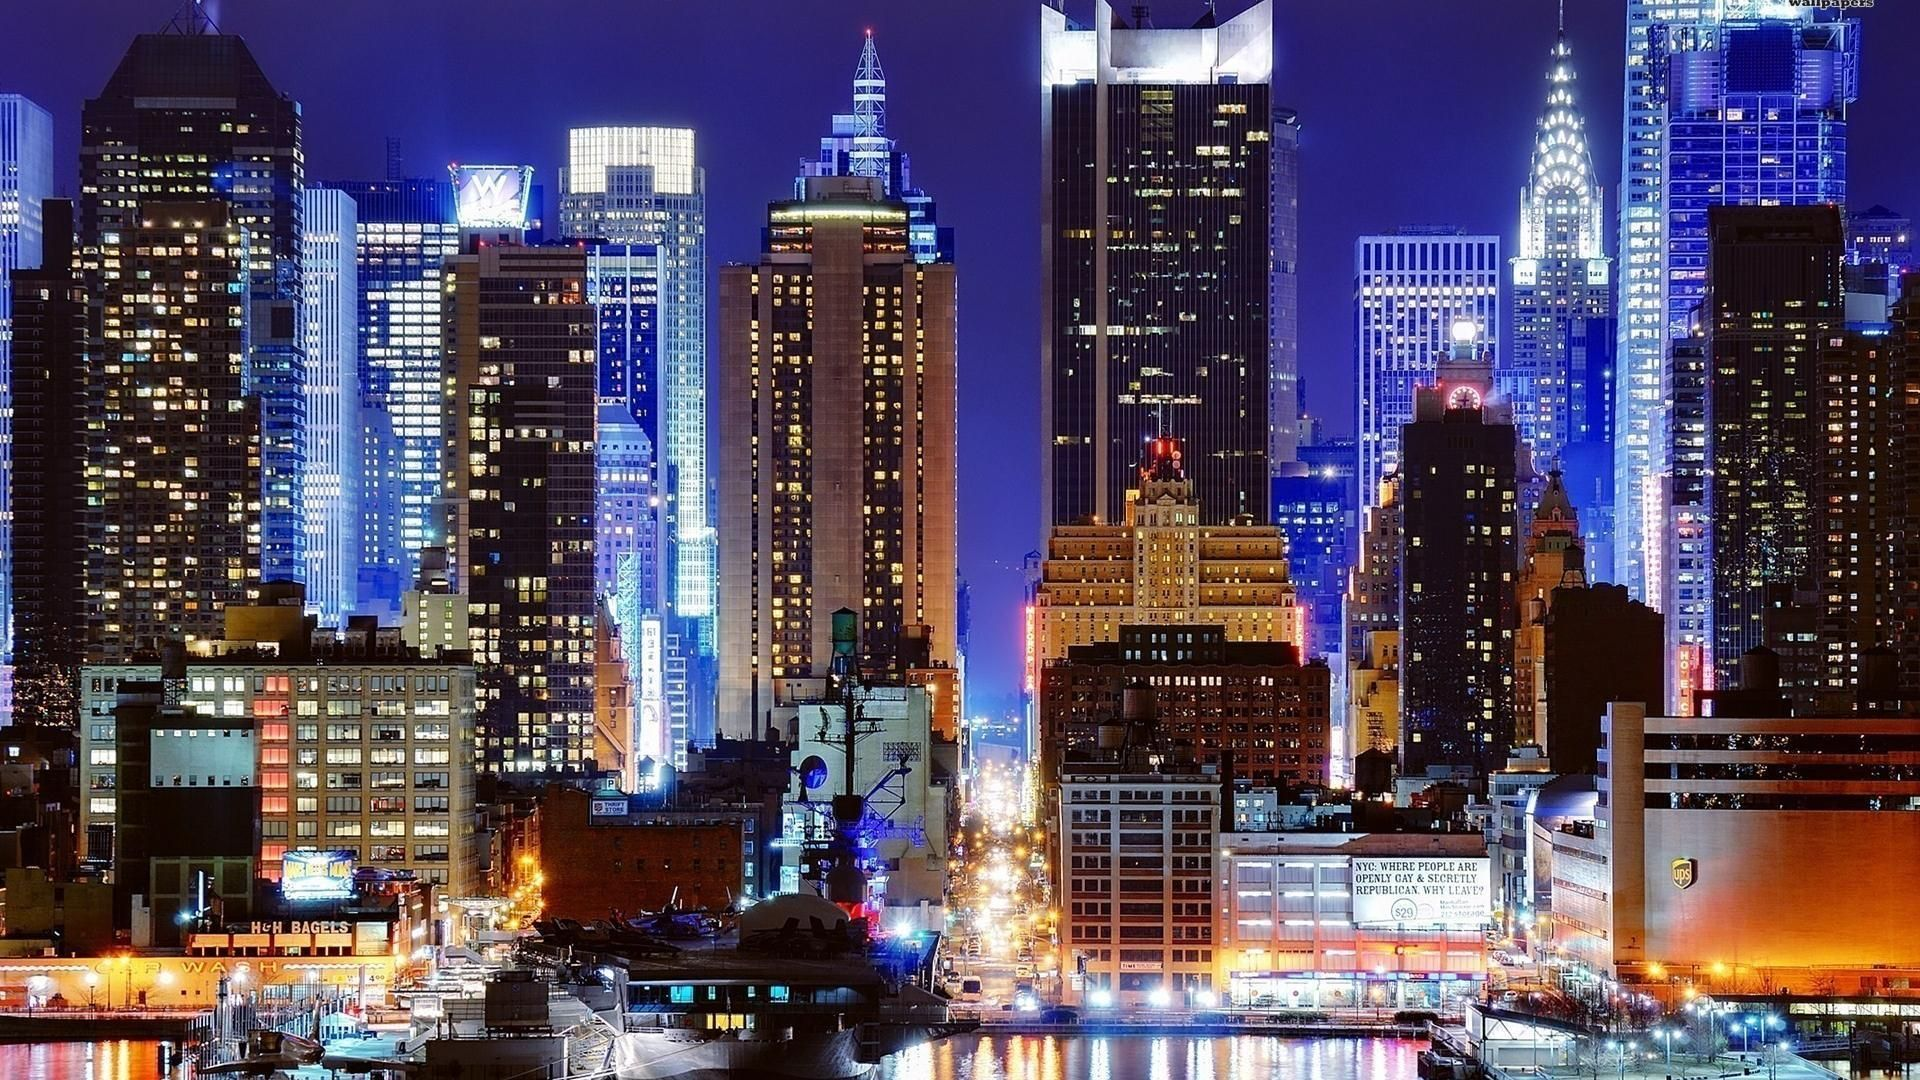 New York City Wallpapers 2014 City Wallpaper New York New York Skyline